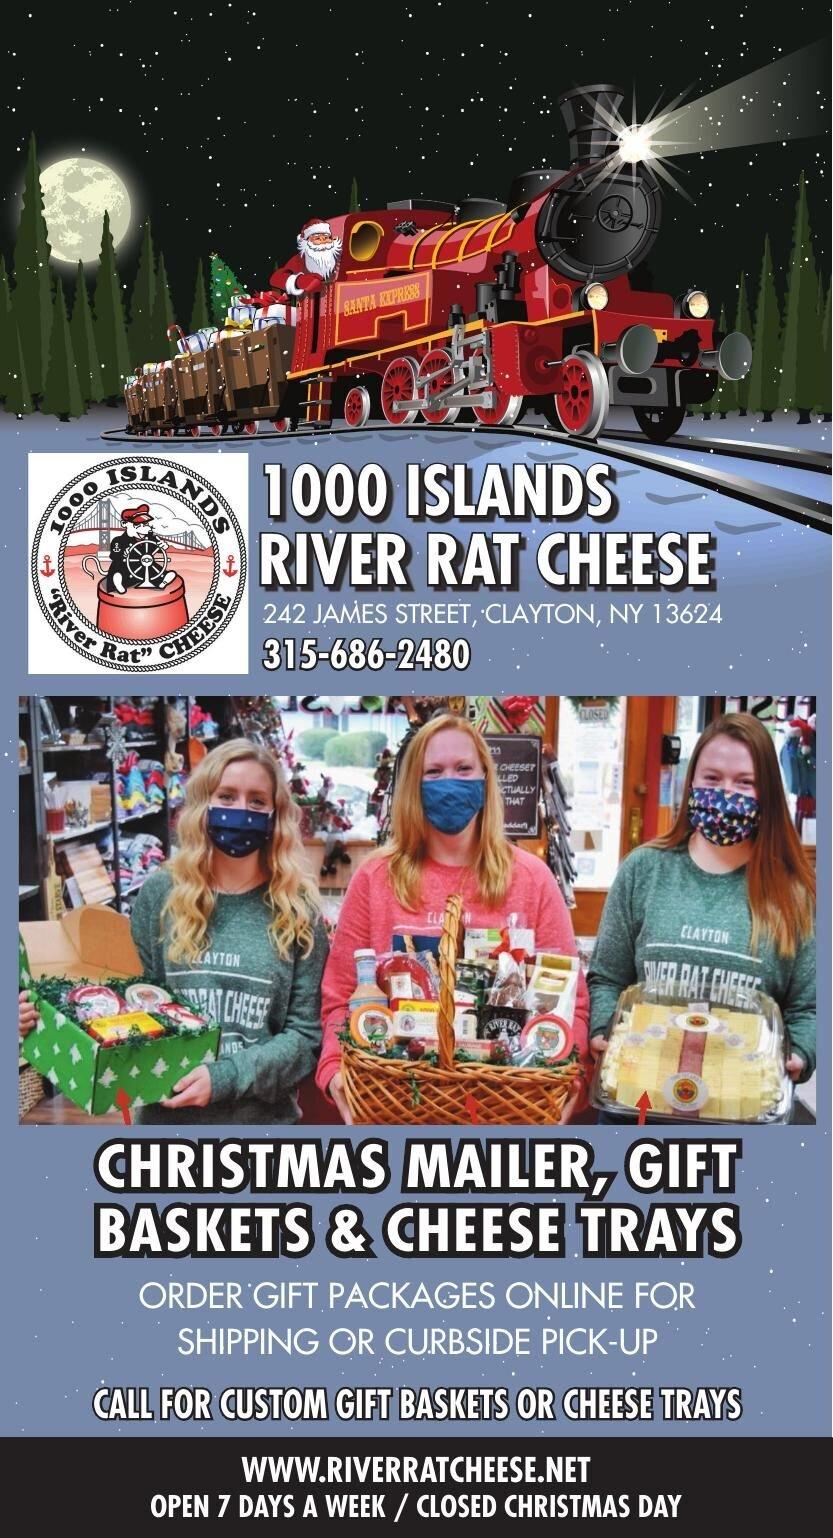 1000 Islands River Rat Cheese